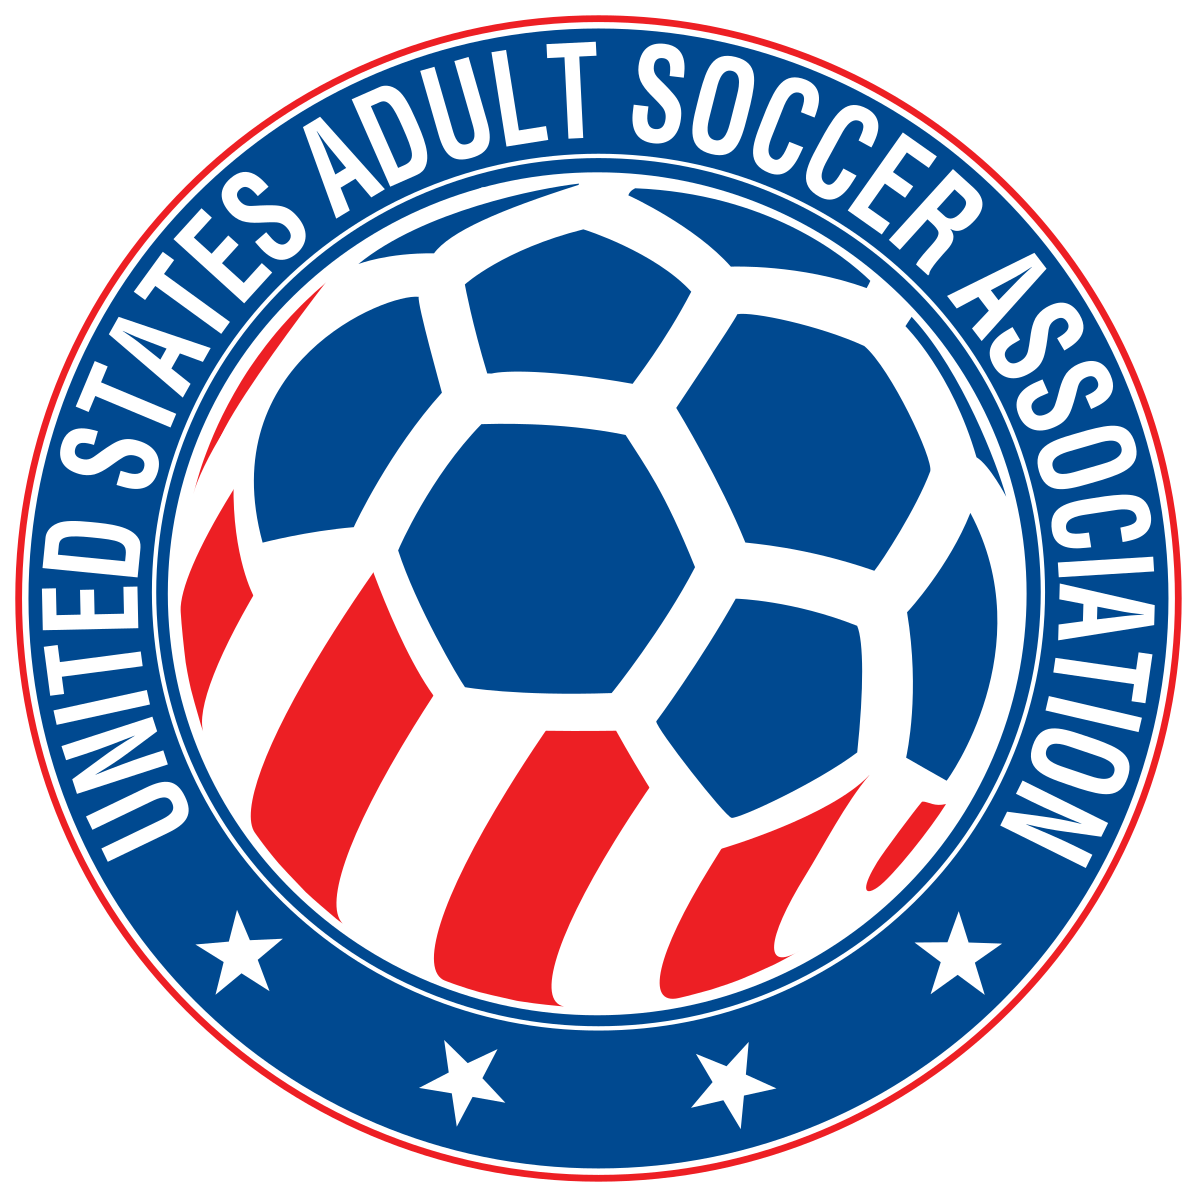 Association adult united state soccer